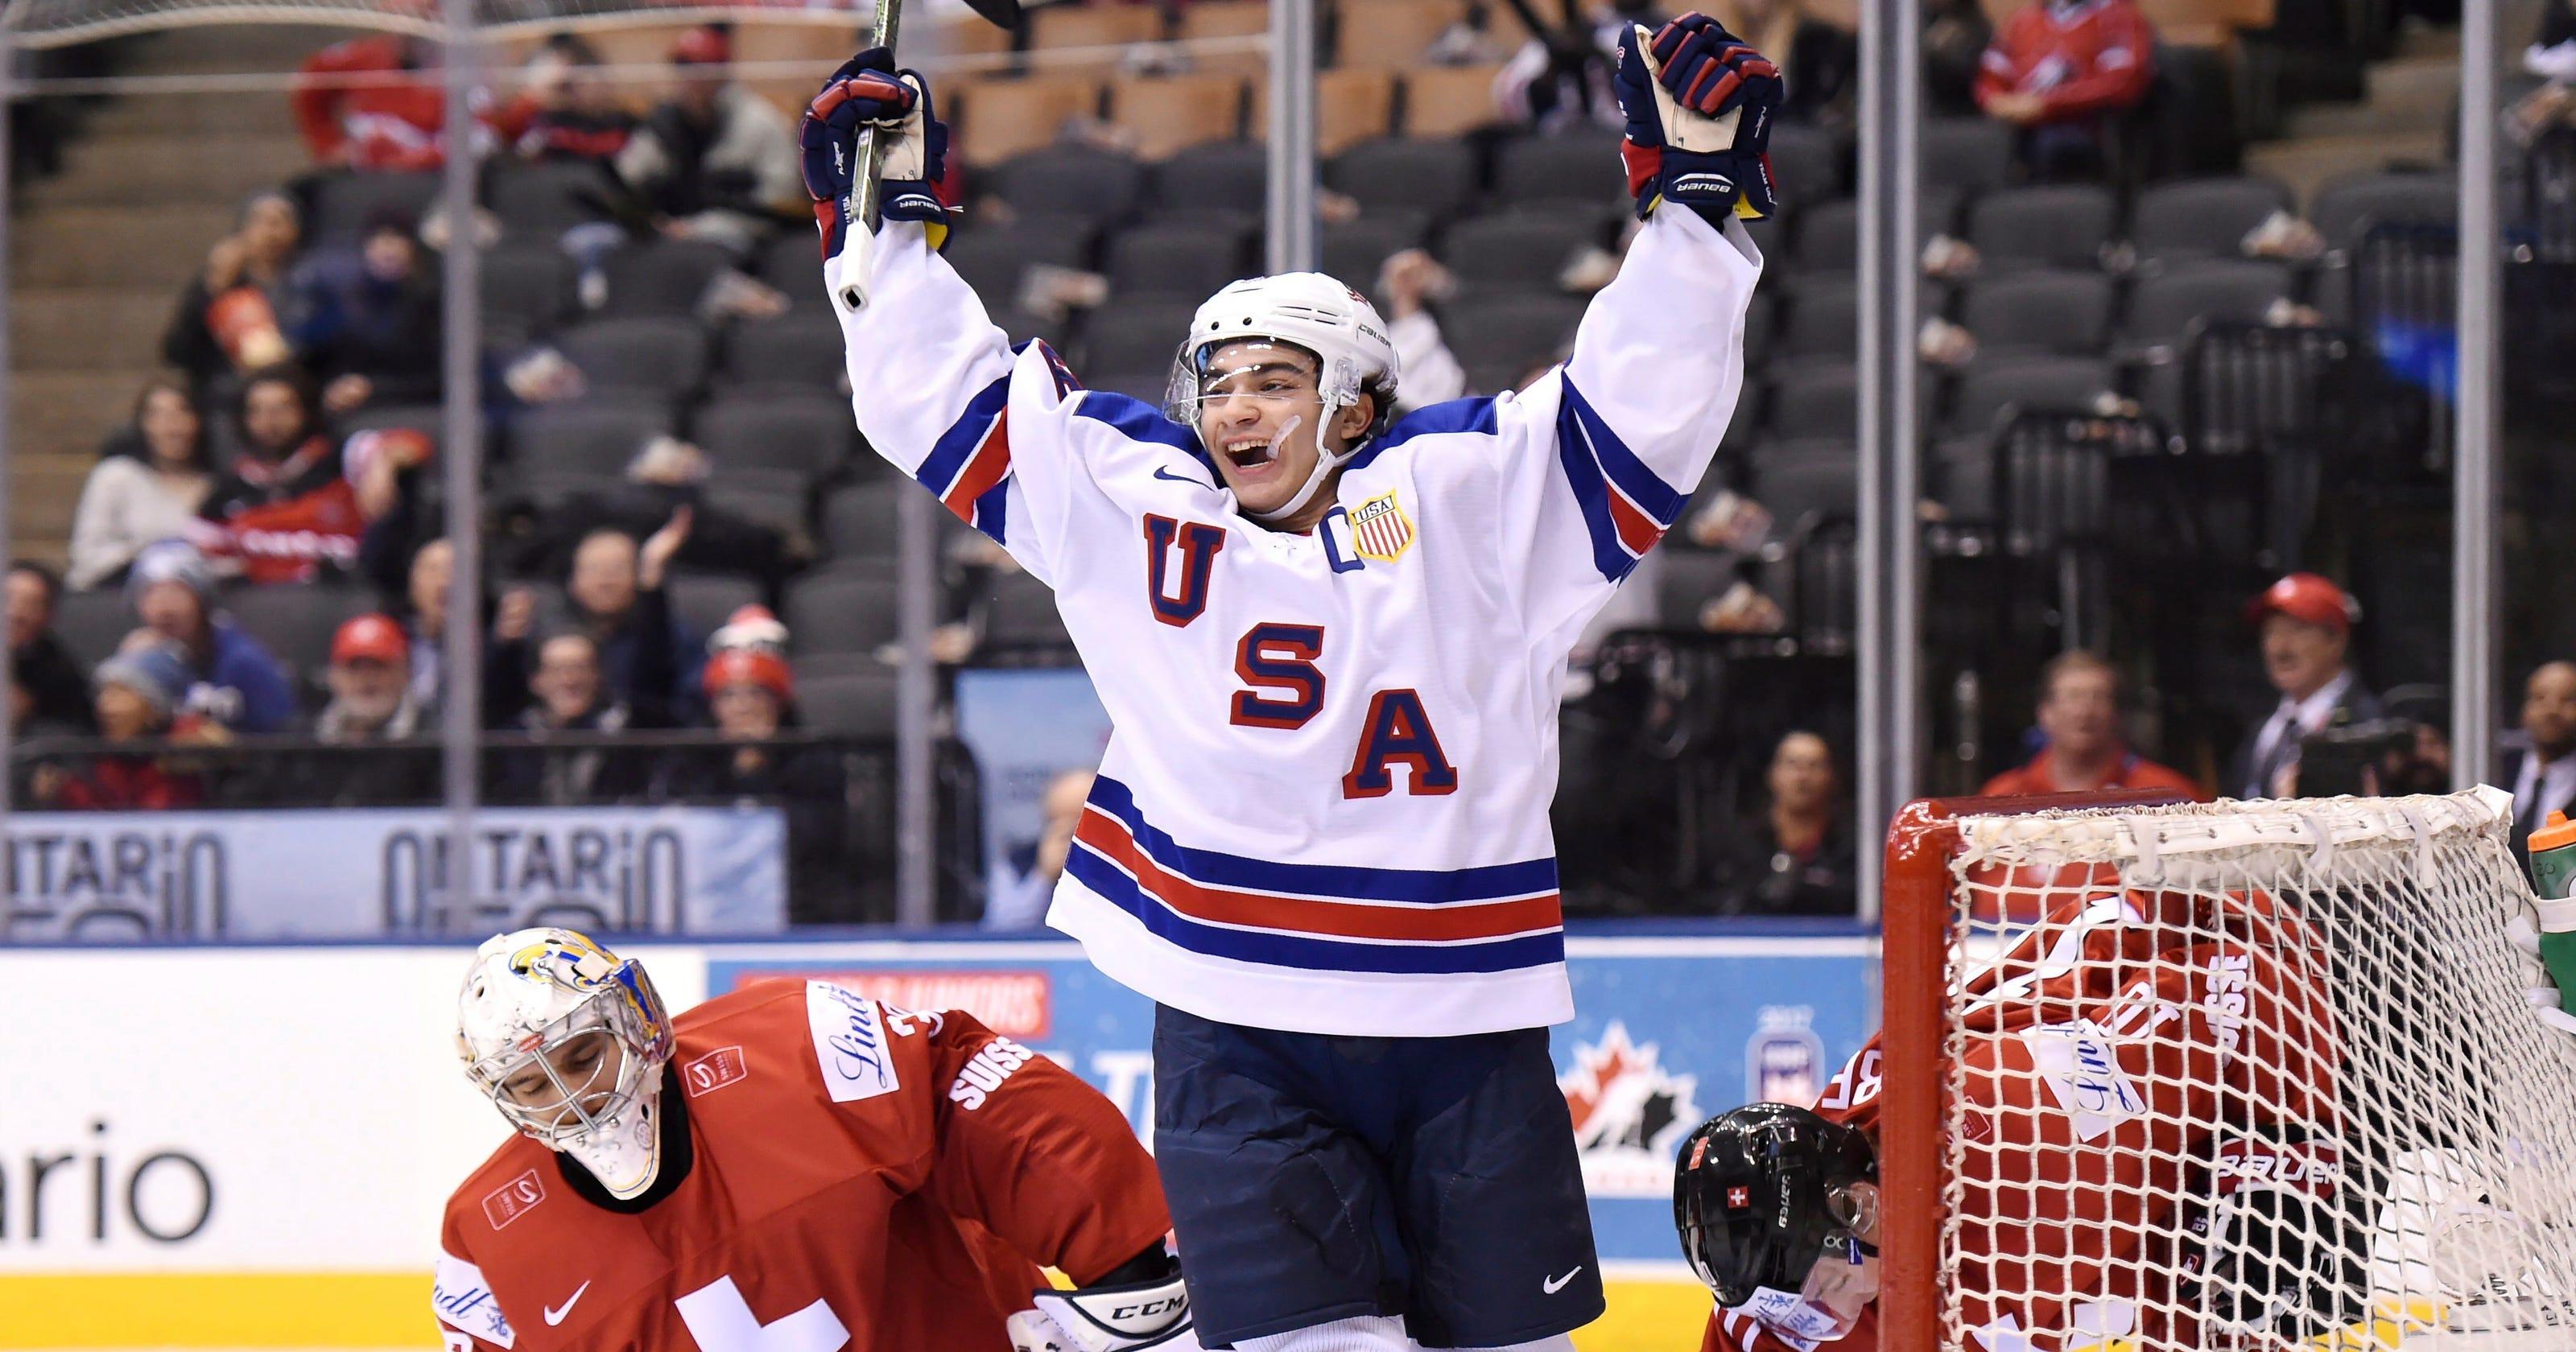 f0465baf6df U.S. beats Switzerland to advance to hockey world junior semifinals